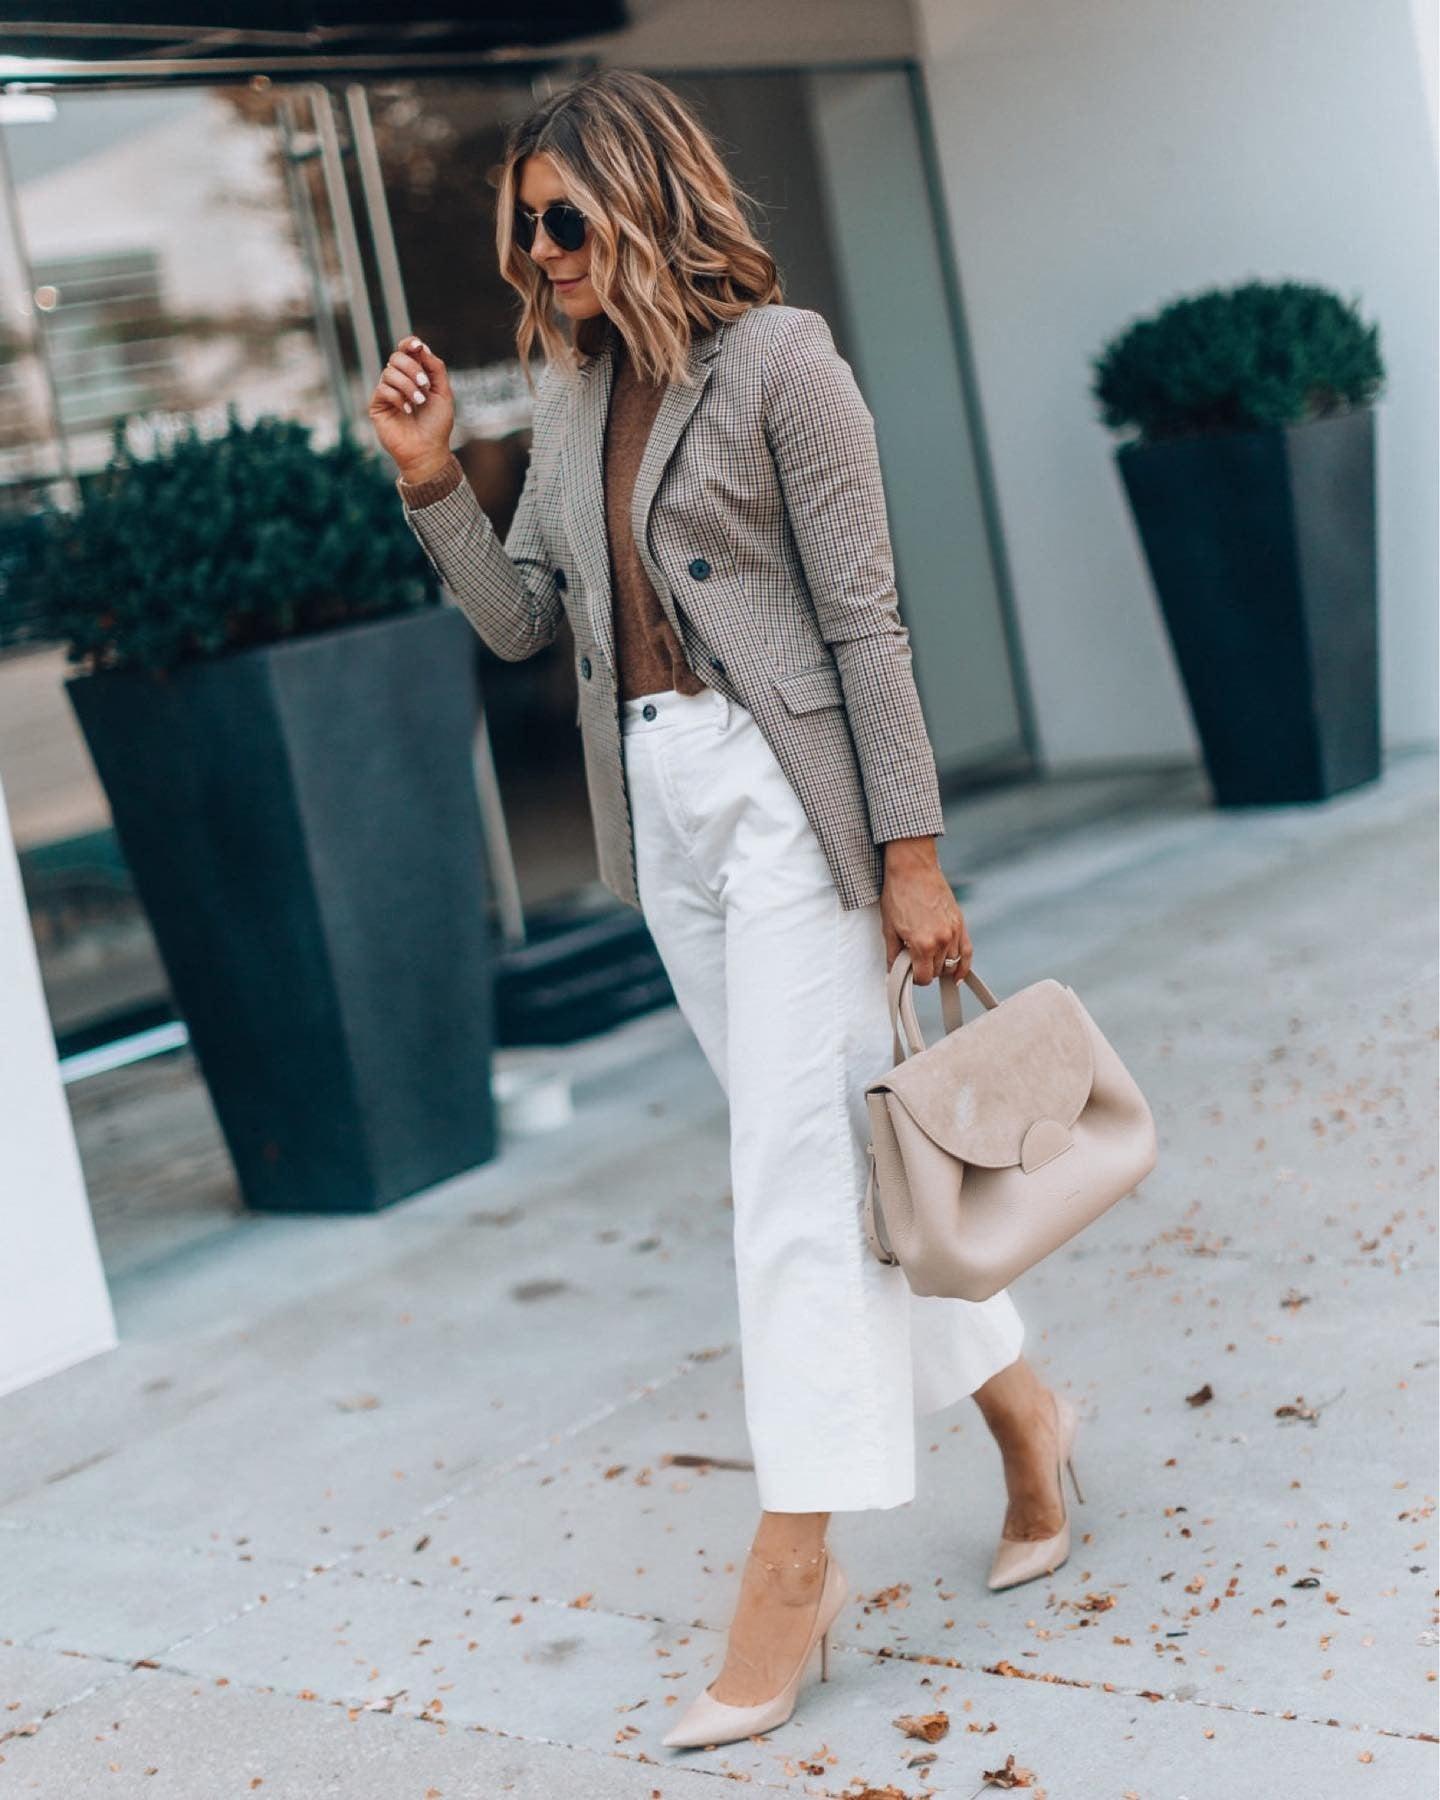 image by cellajaneblog containing Clothing, White, Street fashion, Blazer, Fashion